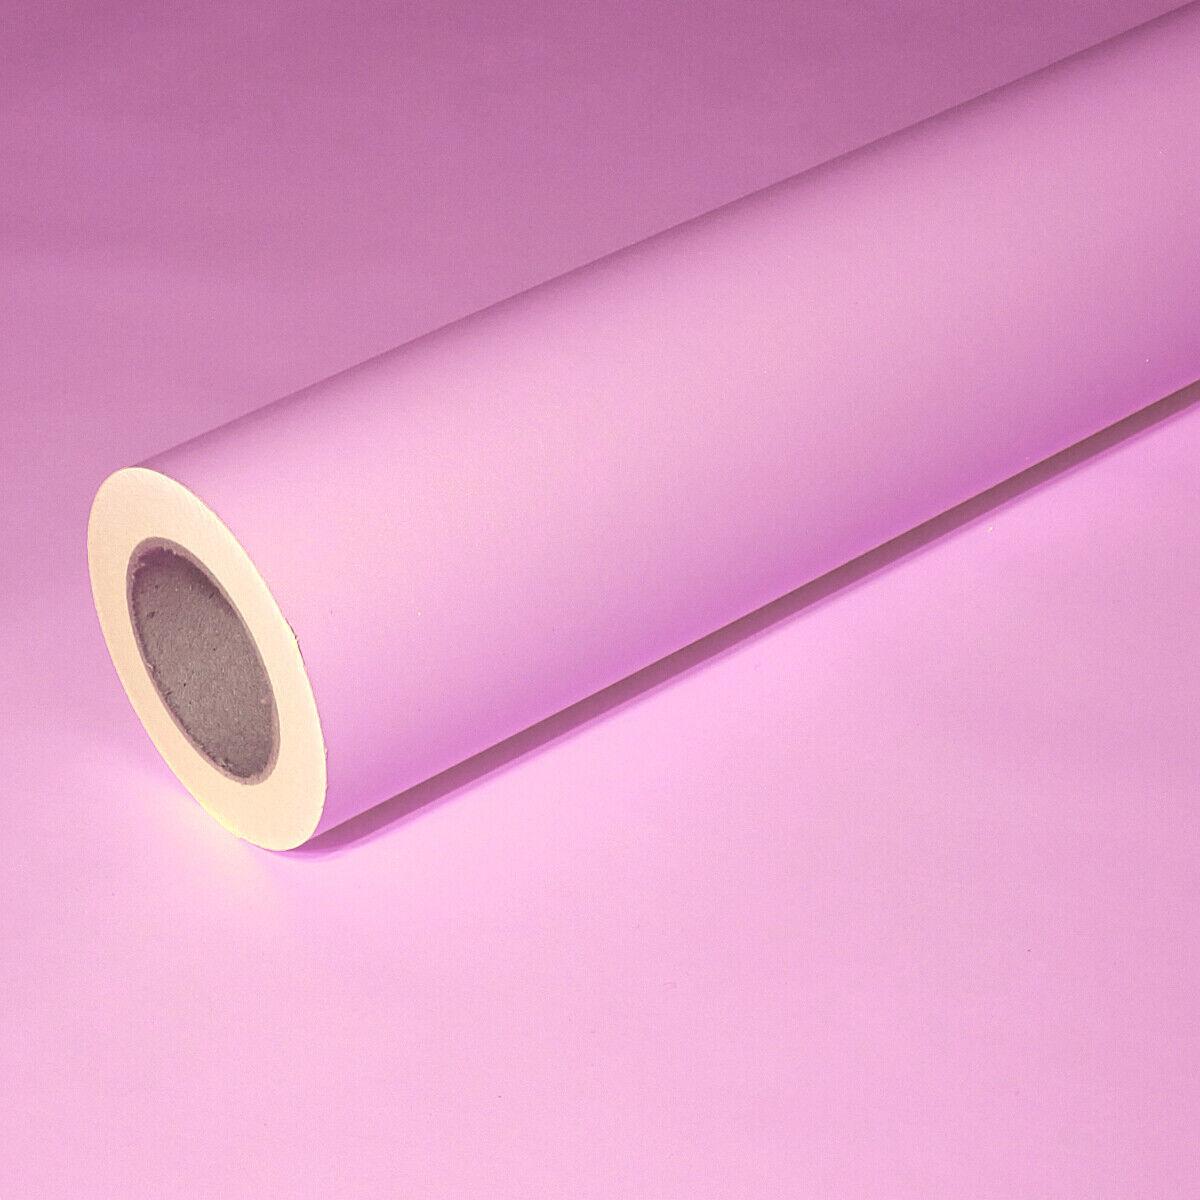 0,47 /m² 50m x 1,00m  junopax regalo de papel resistente a la intemperie mojado firmemente papel Pink